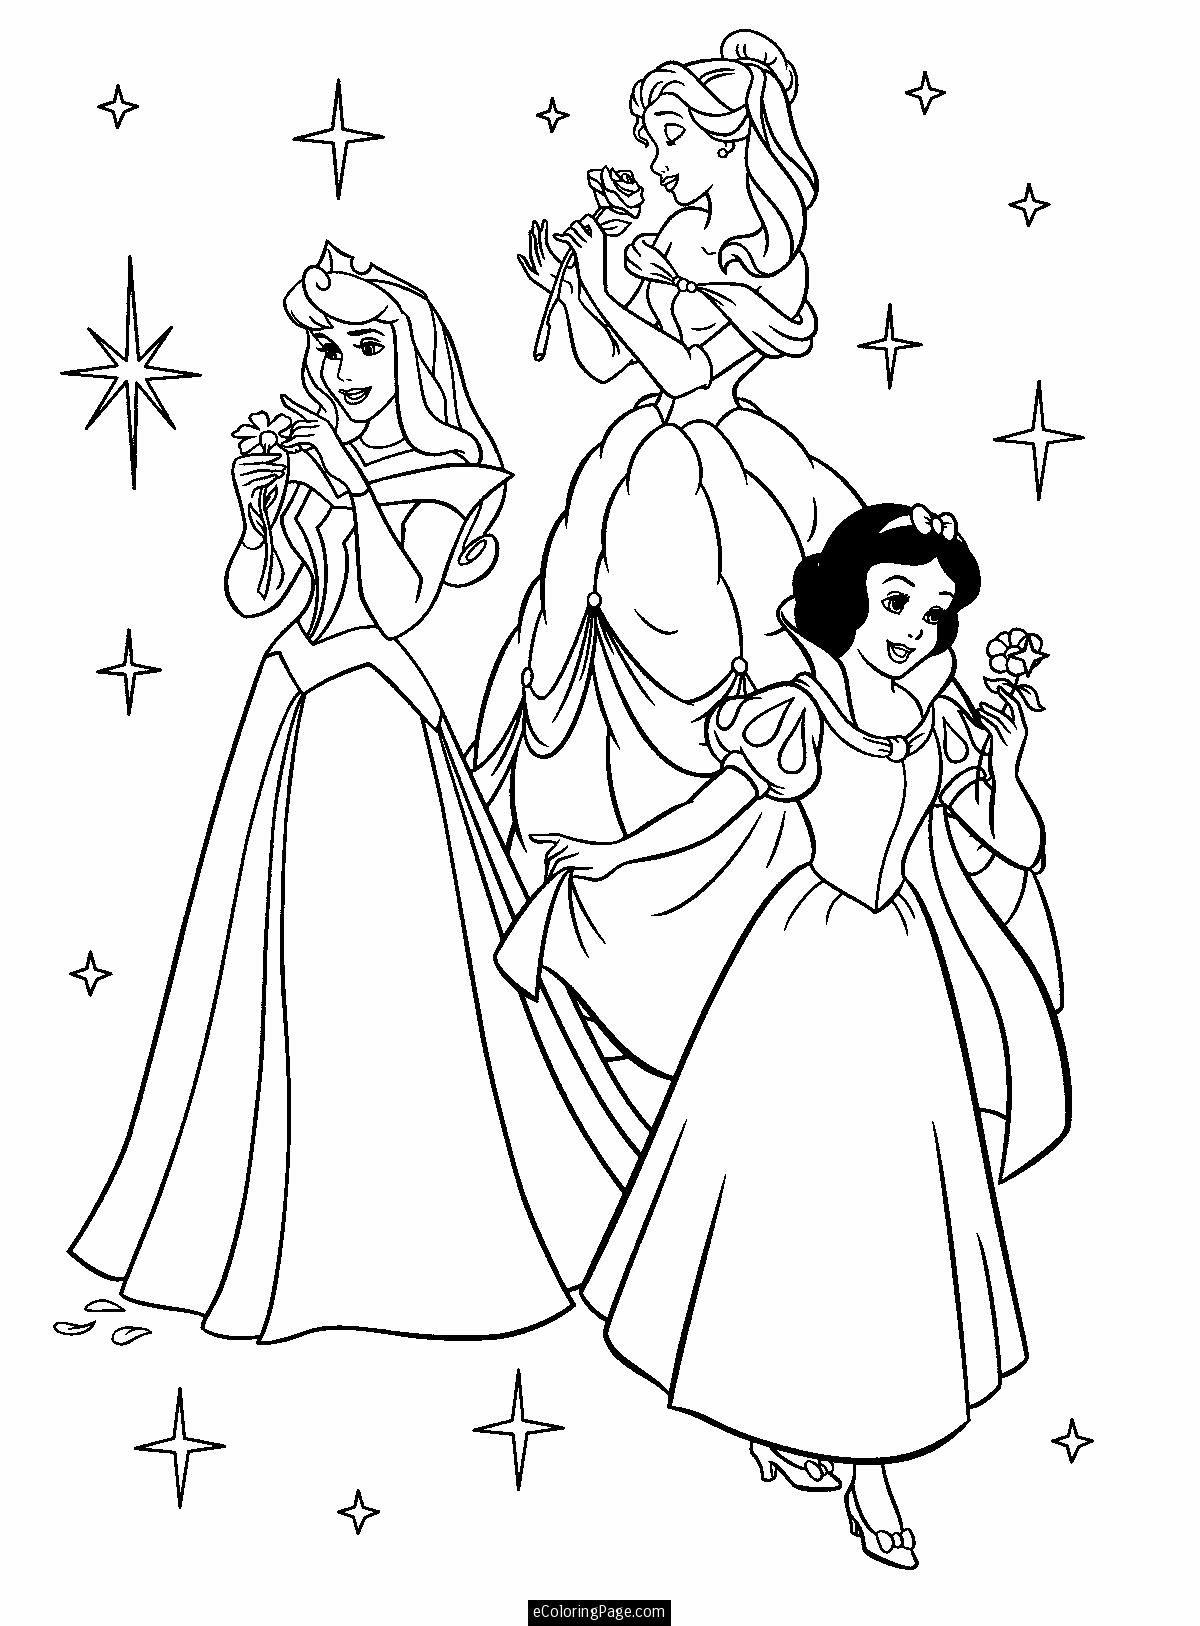 3 Princesses Disney Princess Coloring Pages Disney Coloring Pages Disney Princess Colors